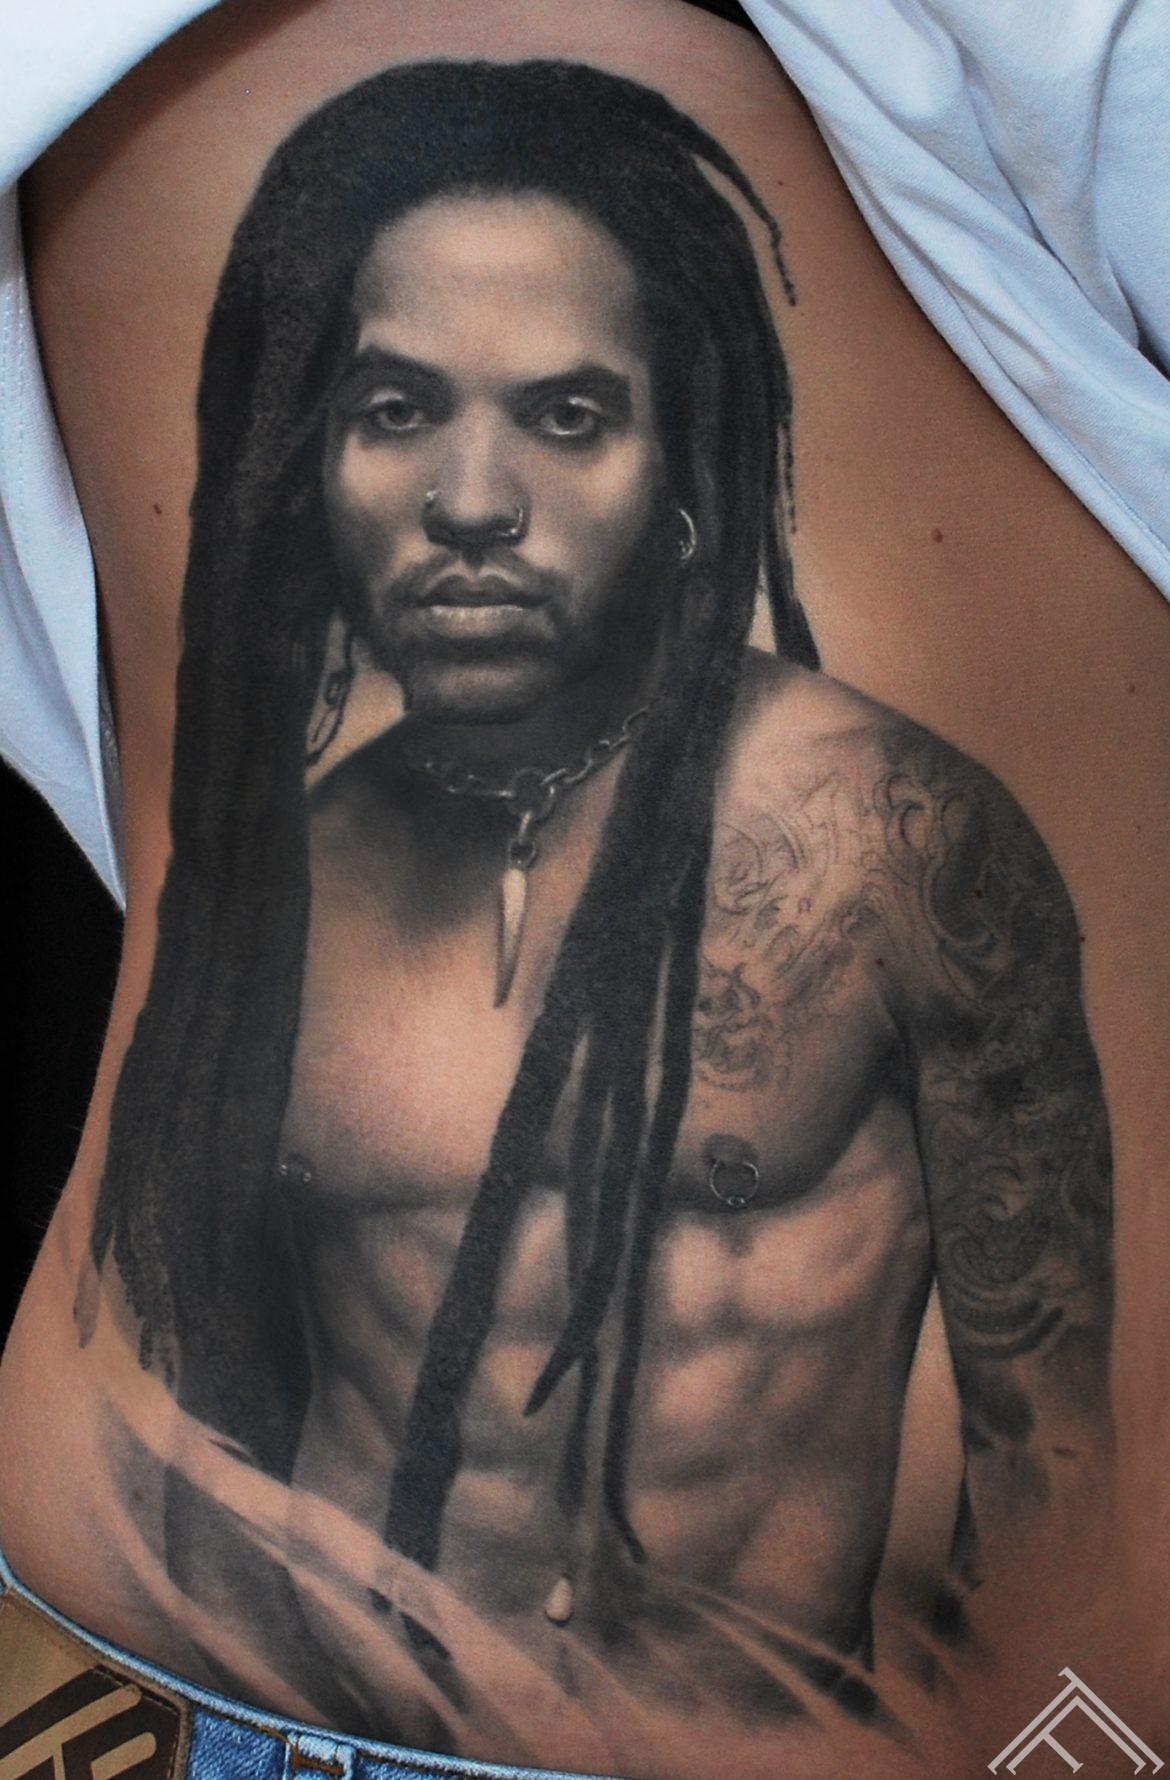 LennyKravitz-tattoo-tattoofrequency-marispavlo-riga-tetovejums-music-muzika